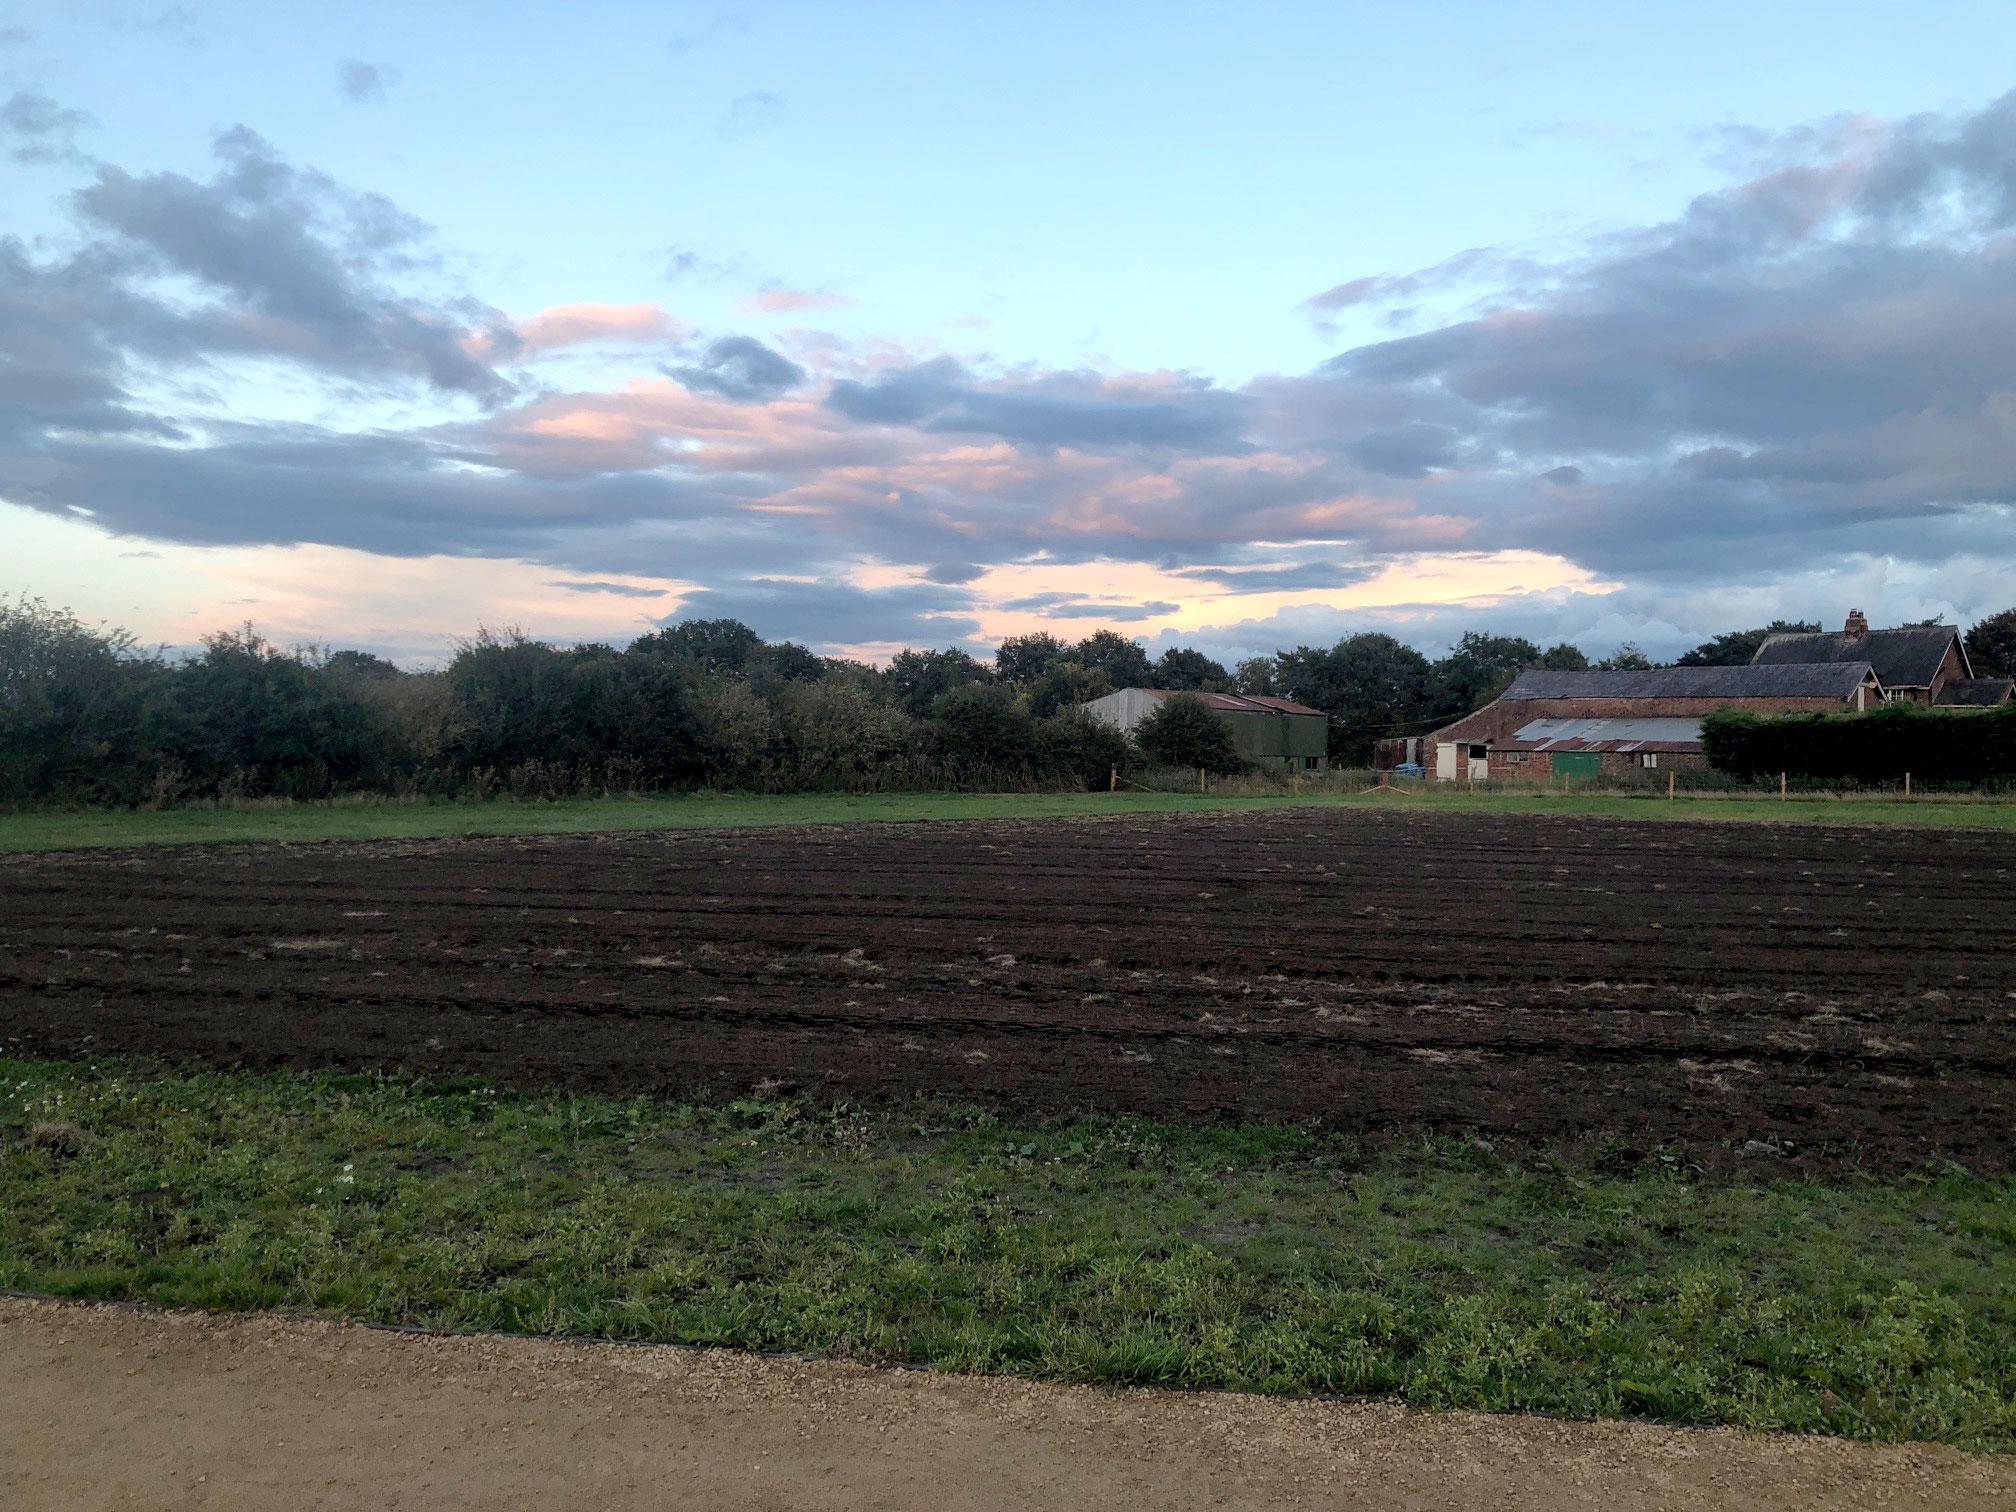 Rheads Meadow seeded